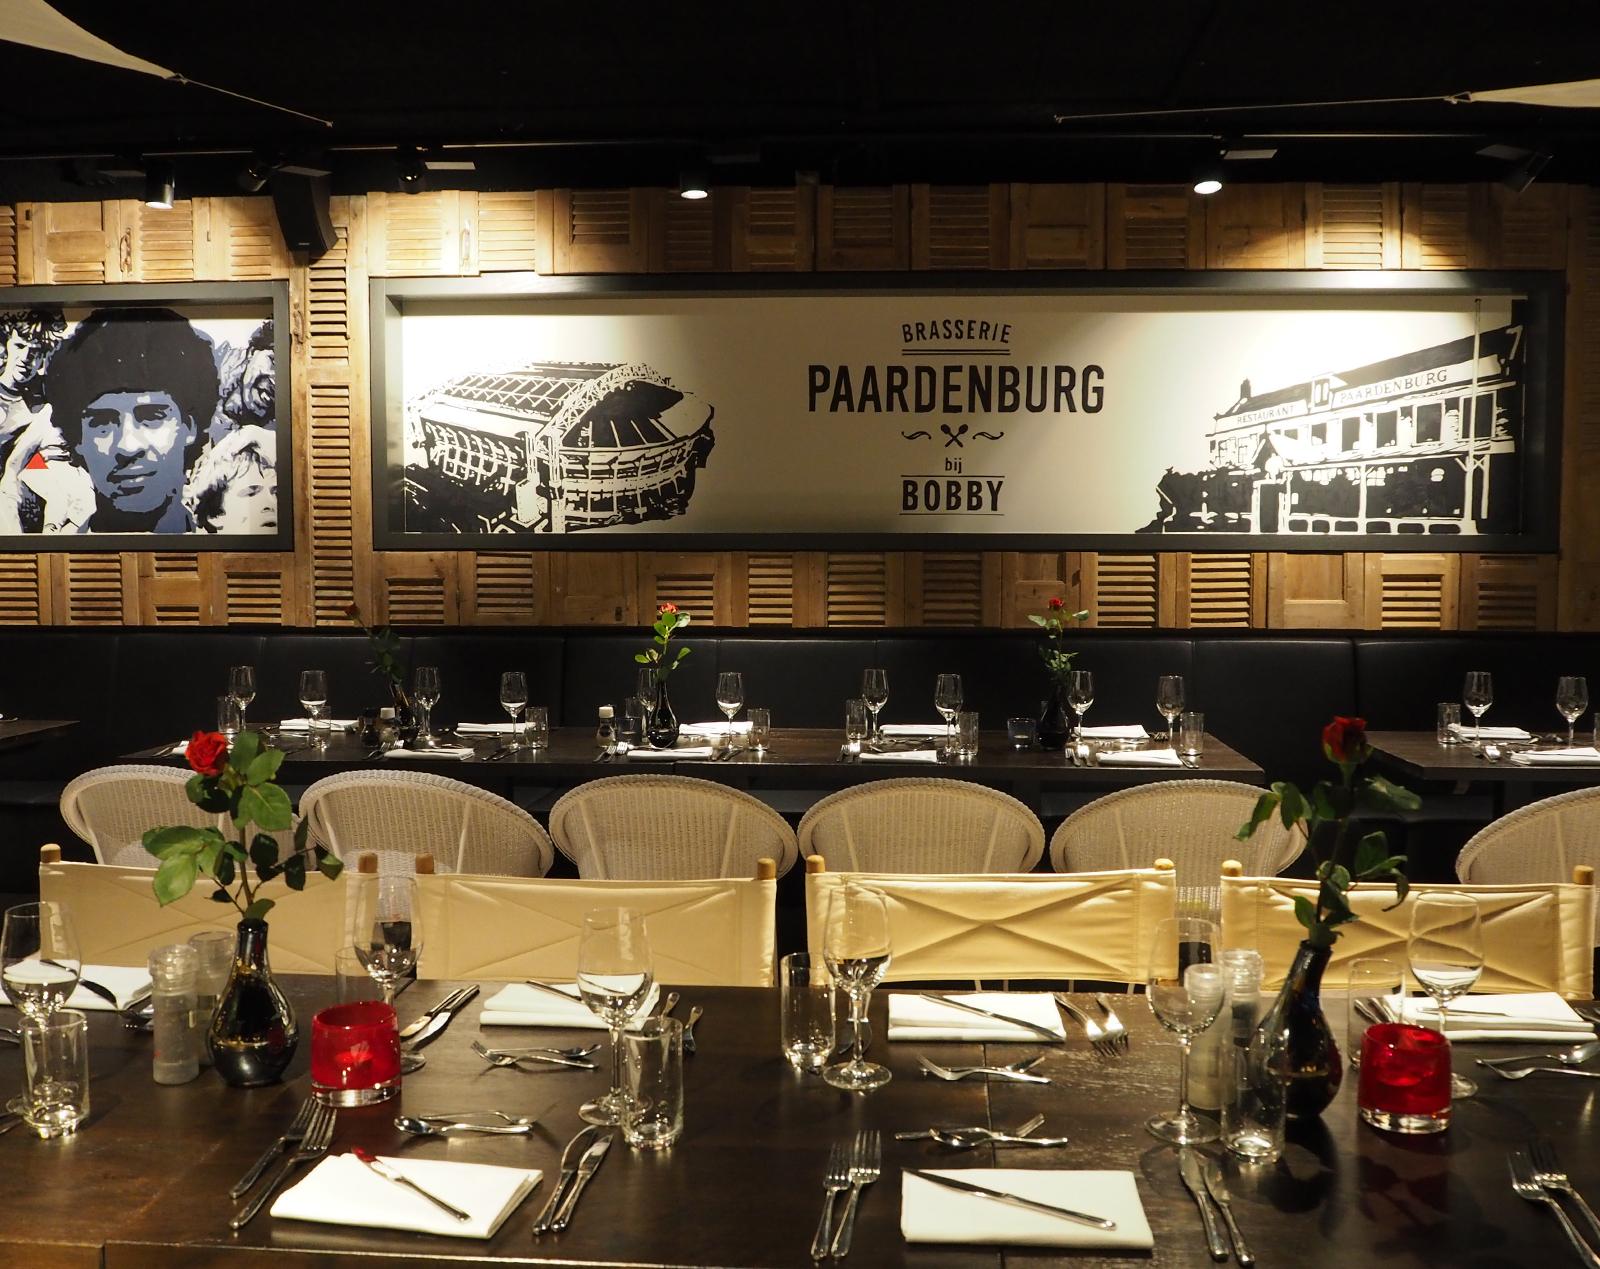 Paardenburg restaurant, Paardenburg bij Bobby, Ajax Amsterdam Arena, skybox stadion, by Jeroen de Nijs